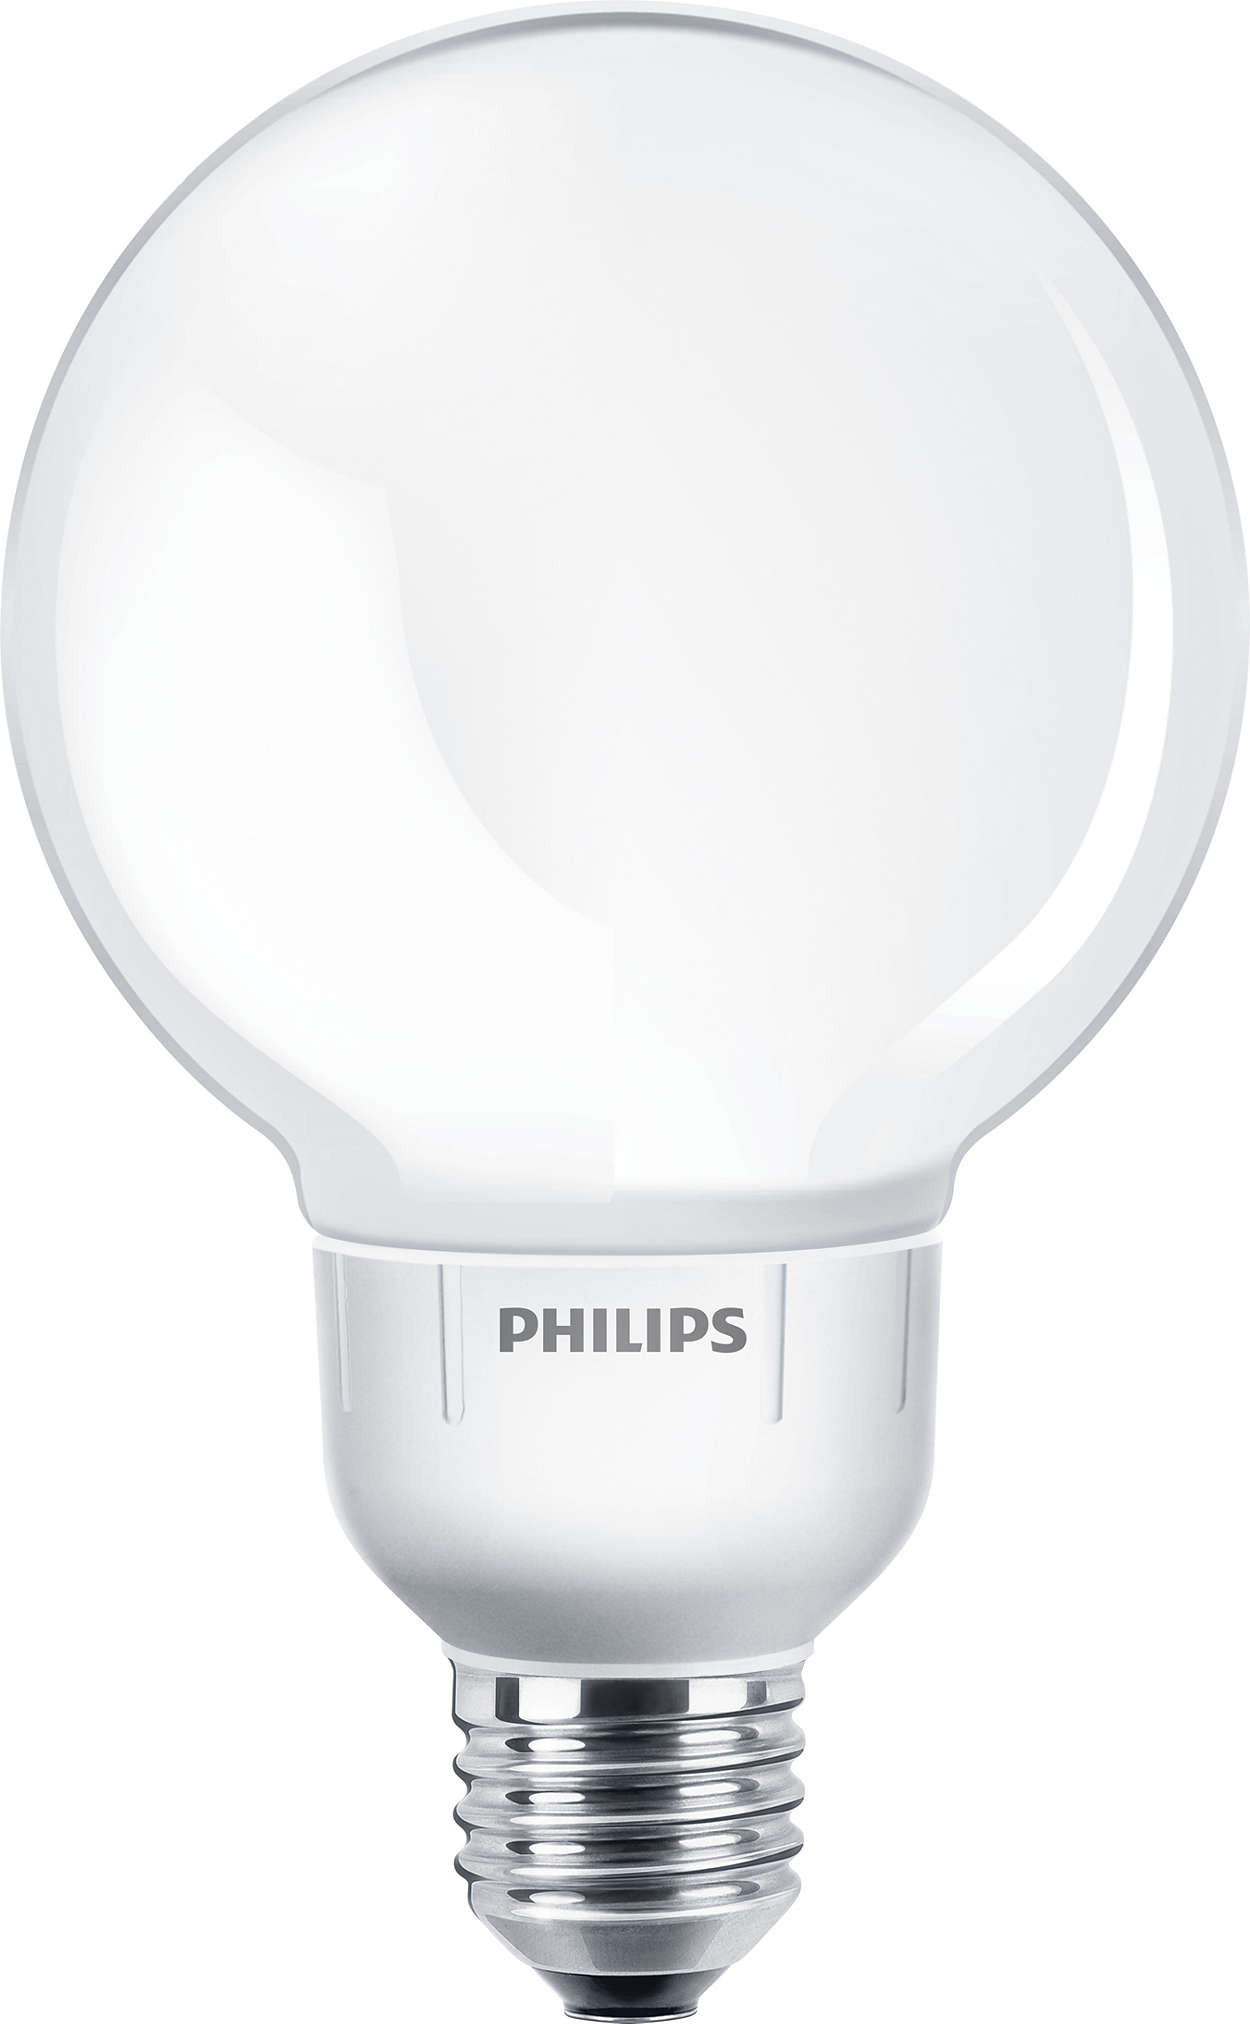 Energiesparlampe Softone Globe G93 9W, E27-Sockel, 410Lm, Startzeit: 10-100 Sek,